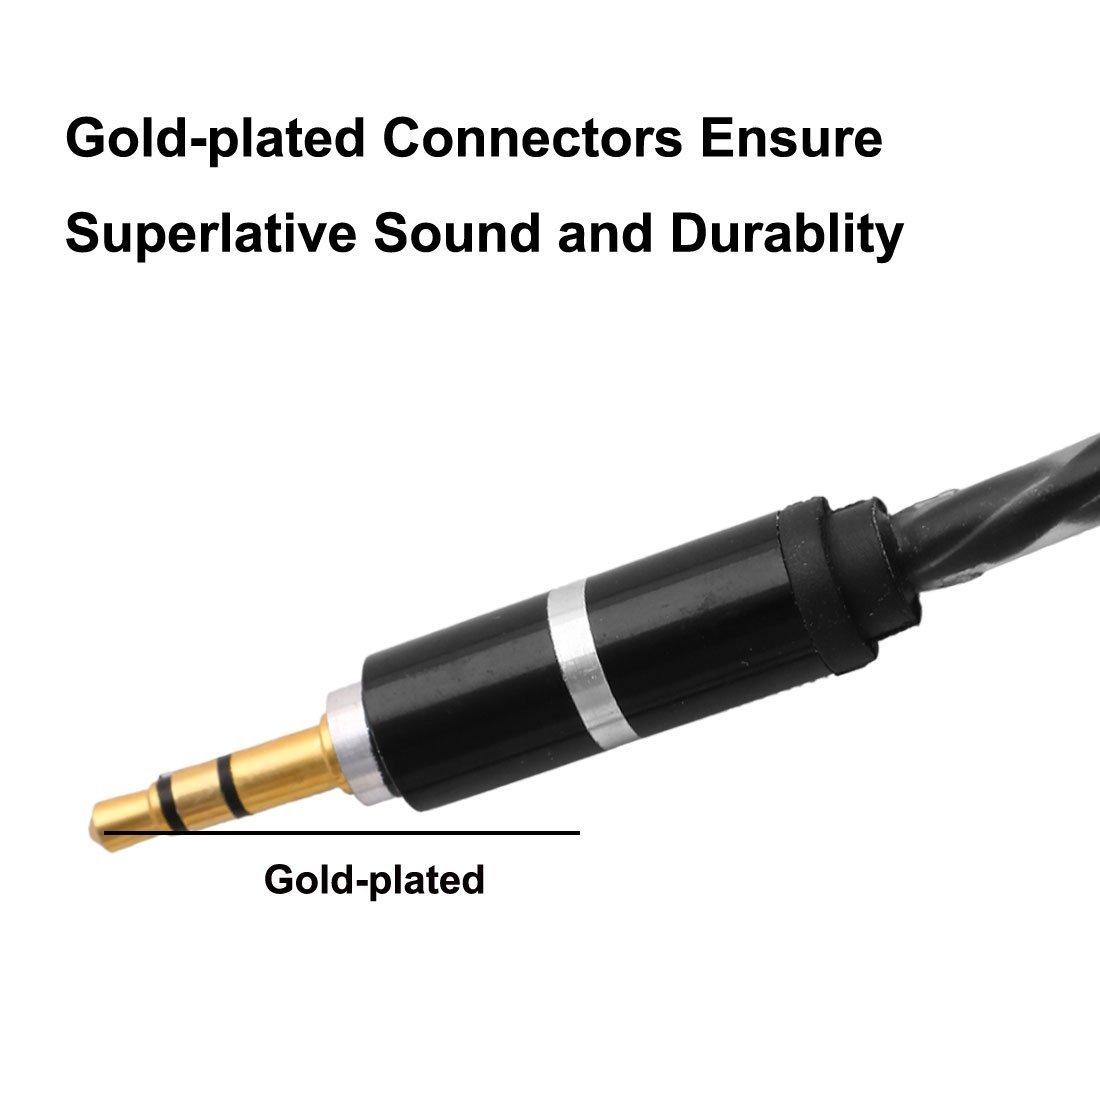 Amazon.com: DealMux Mobile PC Mp4 Telefone 3,5 mm macho para Cabo Masculino Cable M / M conector de áudio 1.02m Long Black: Electronics